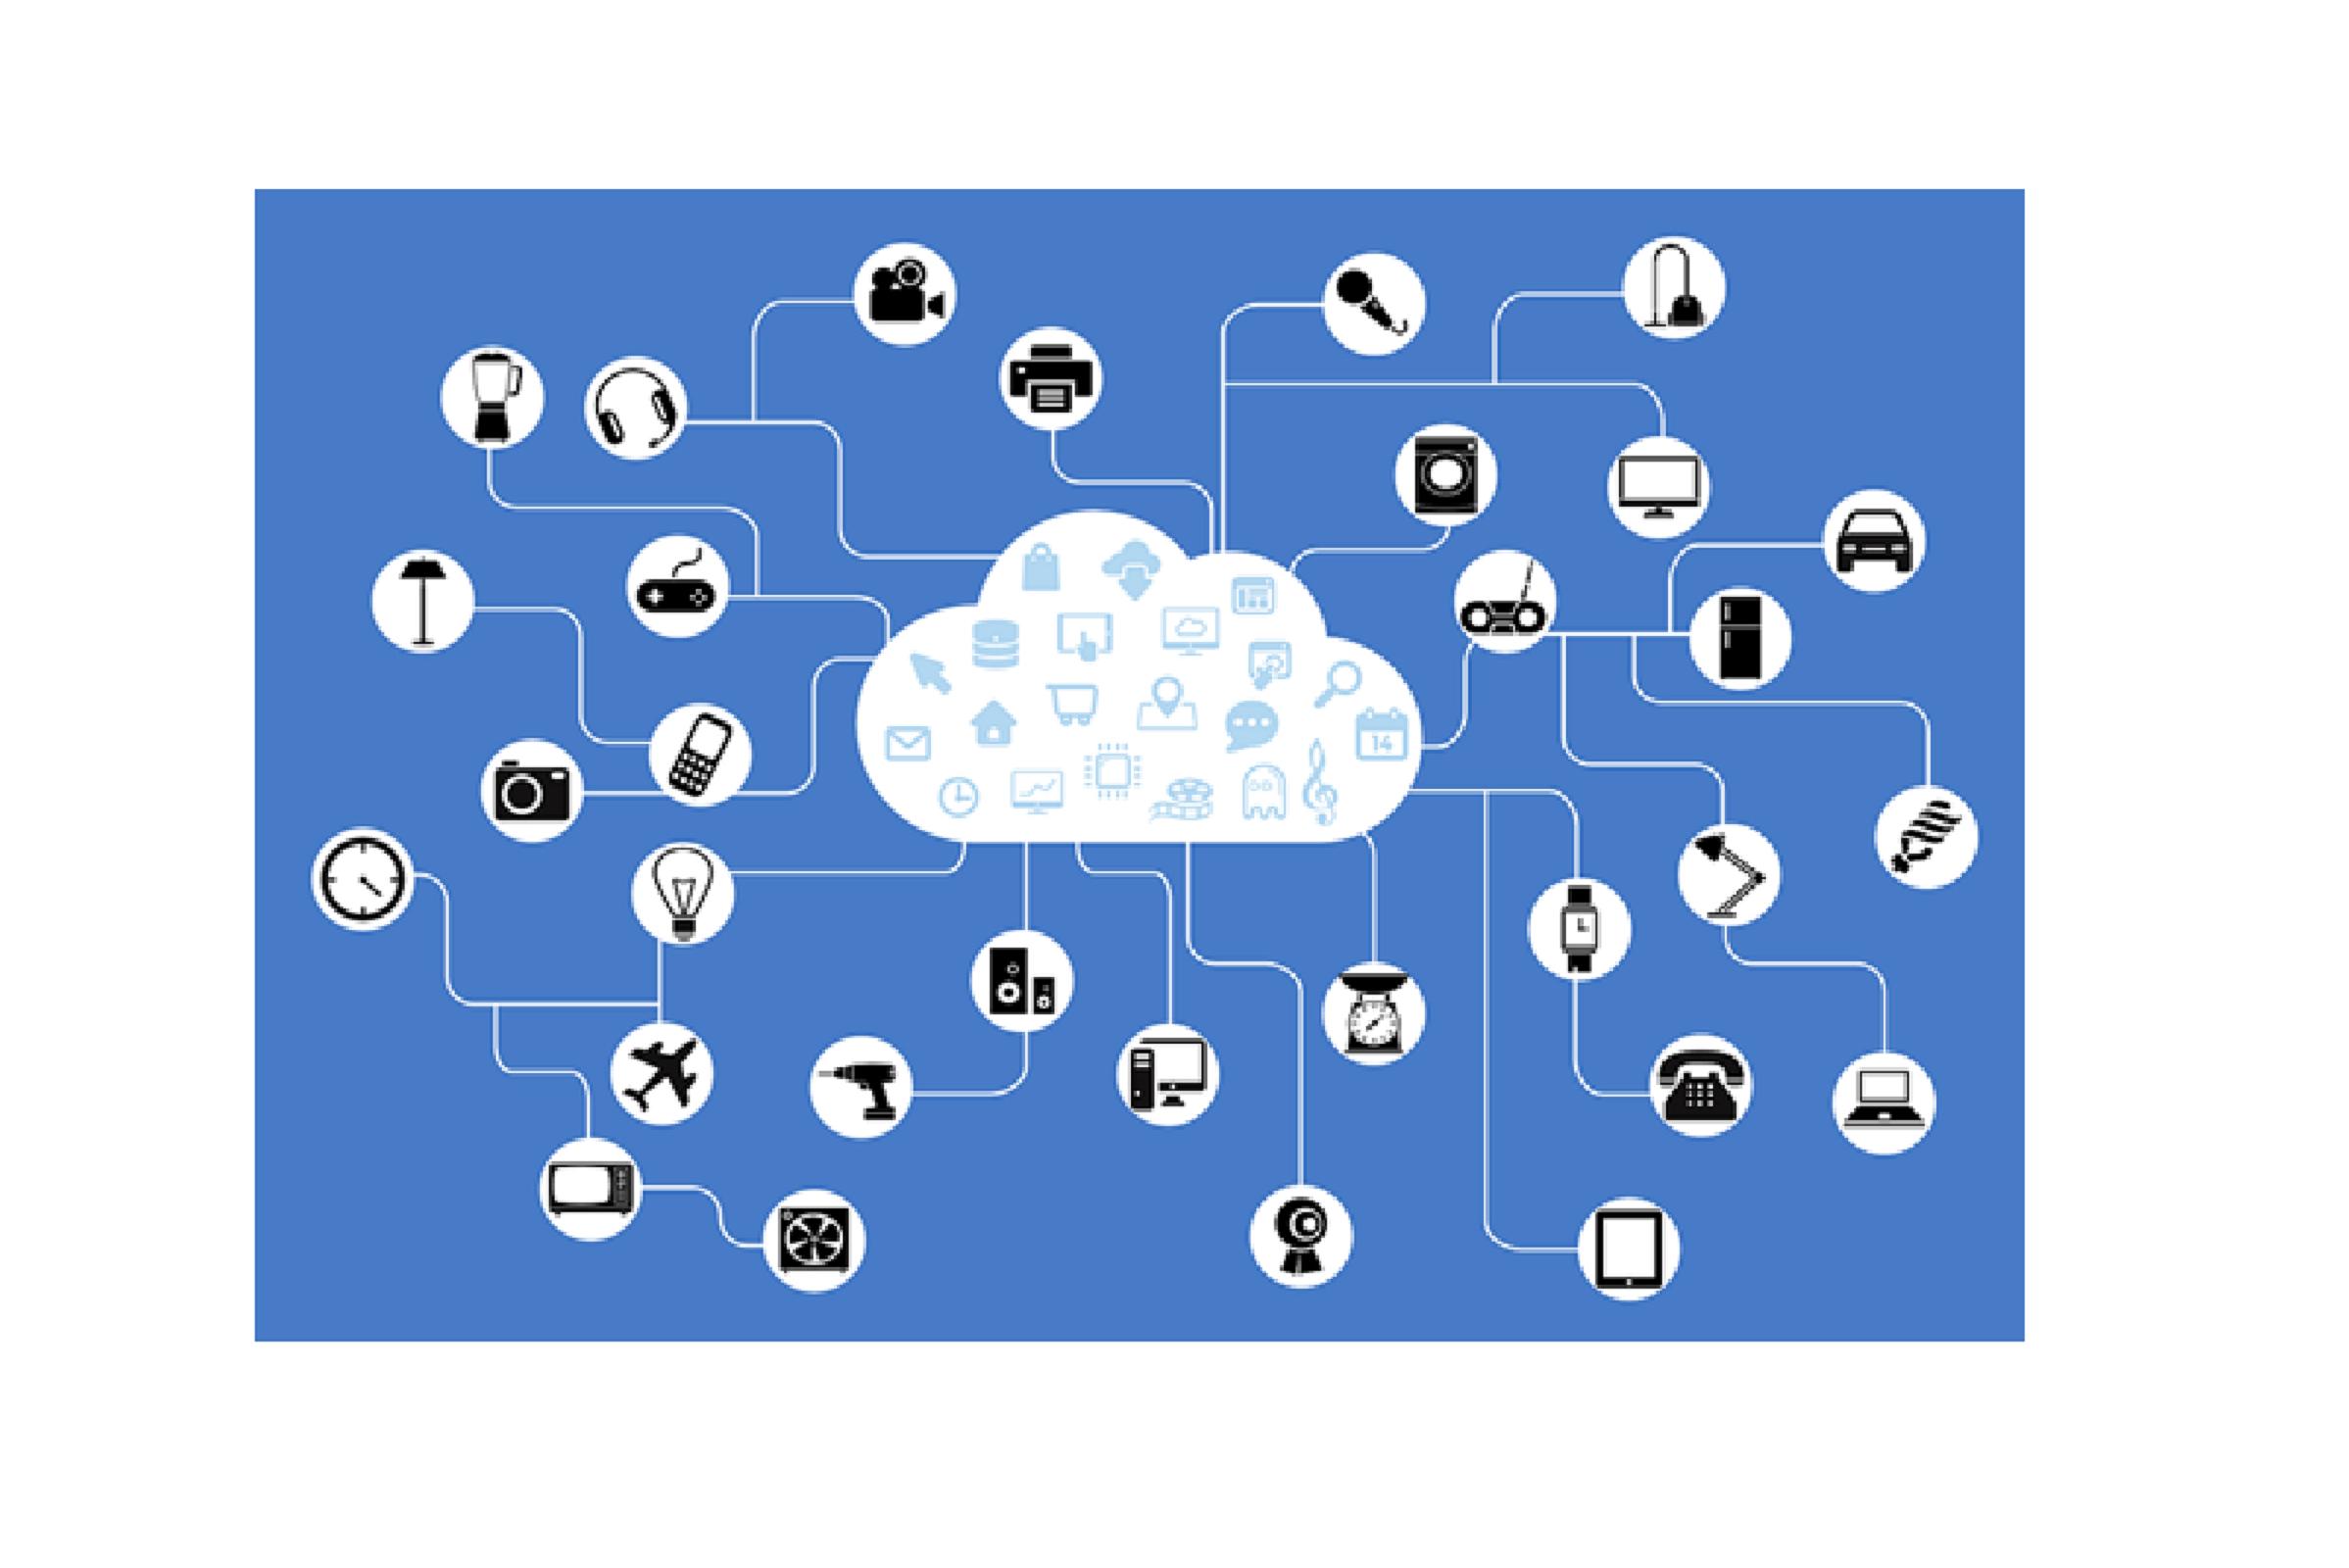 Asus skoncentruje się na IoT, robotach i VR